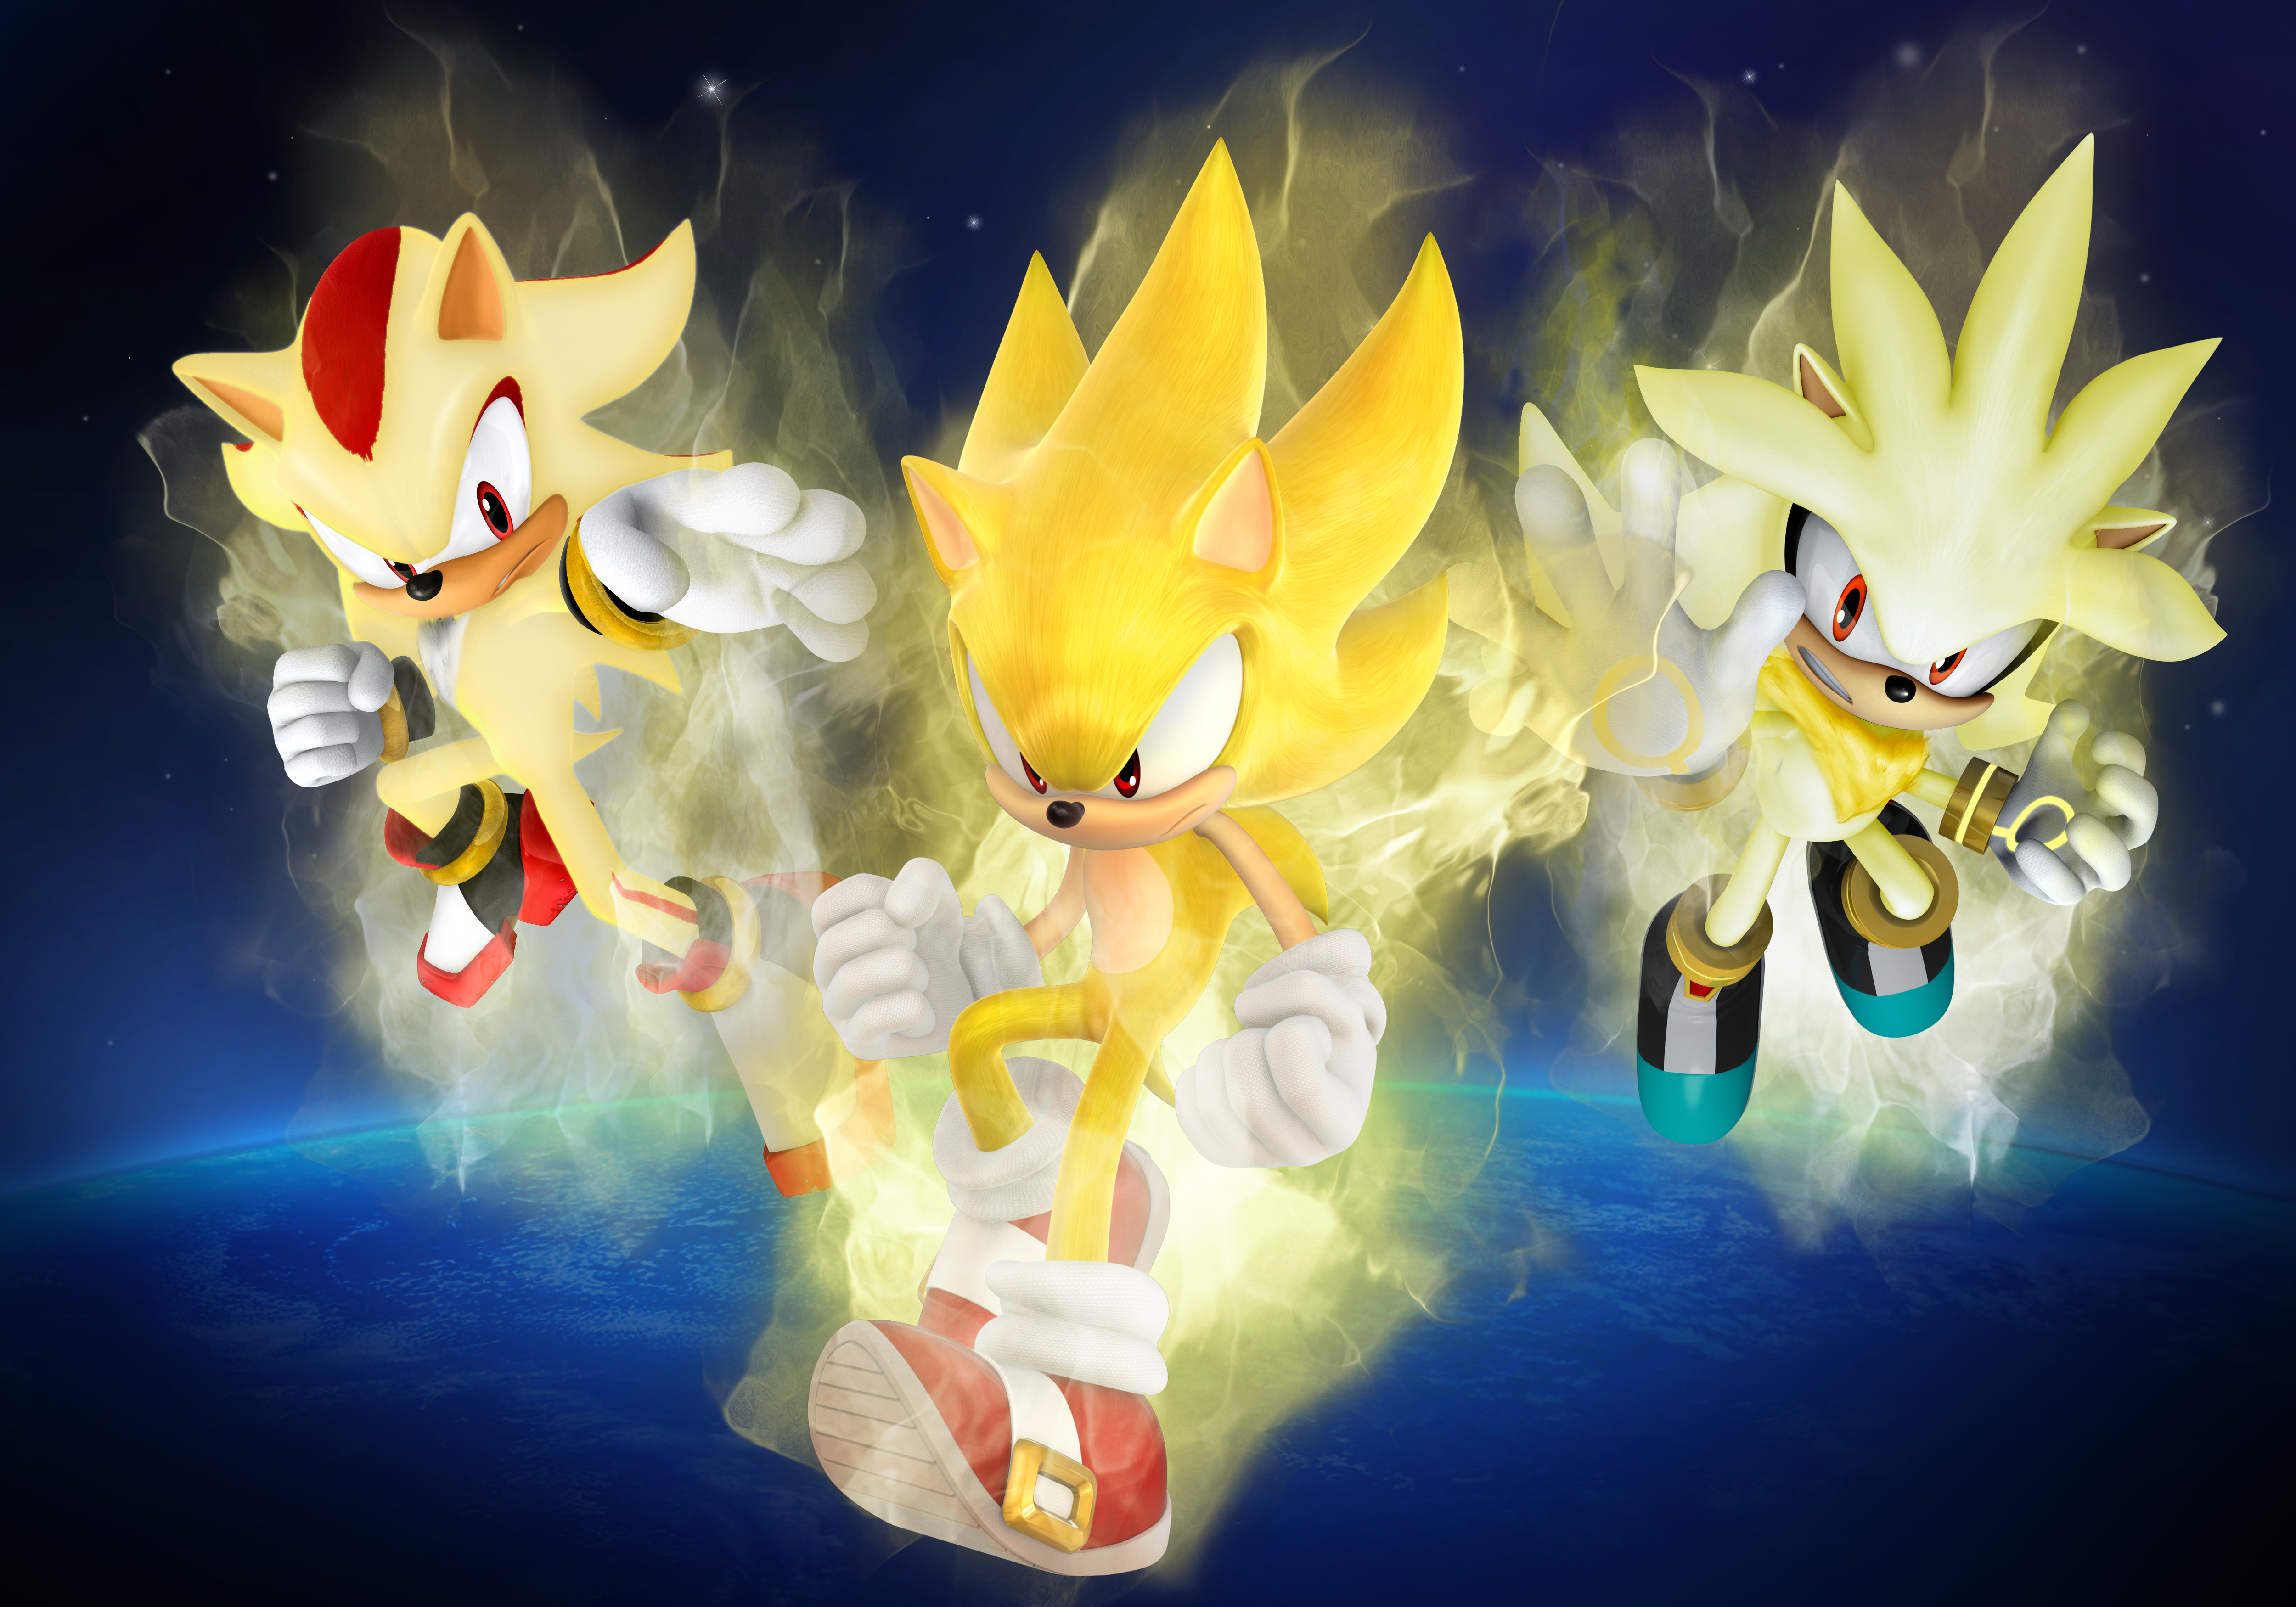 Sonic The Hedgehog 2006 4k Ultra Hd Wallpaper Background Image